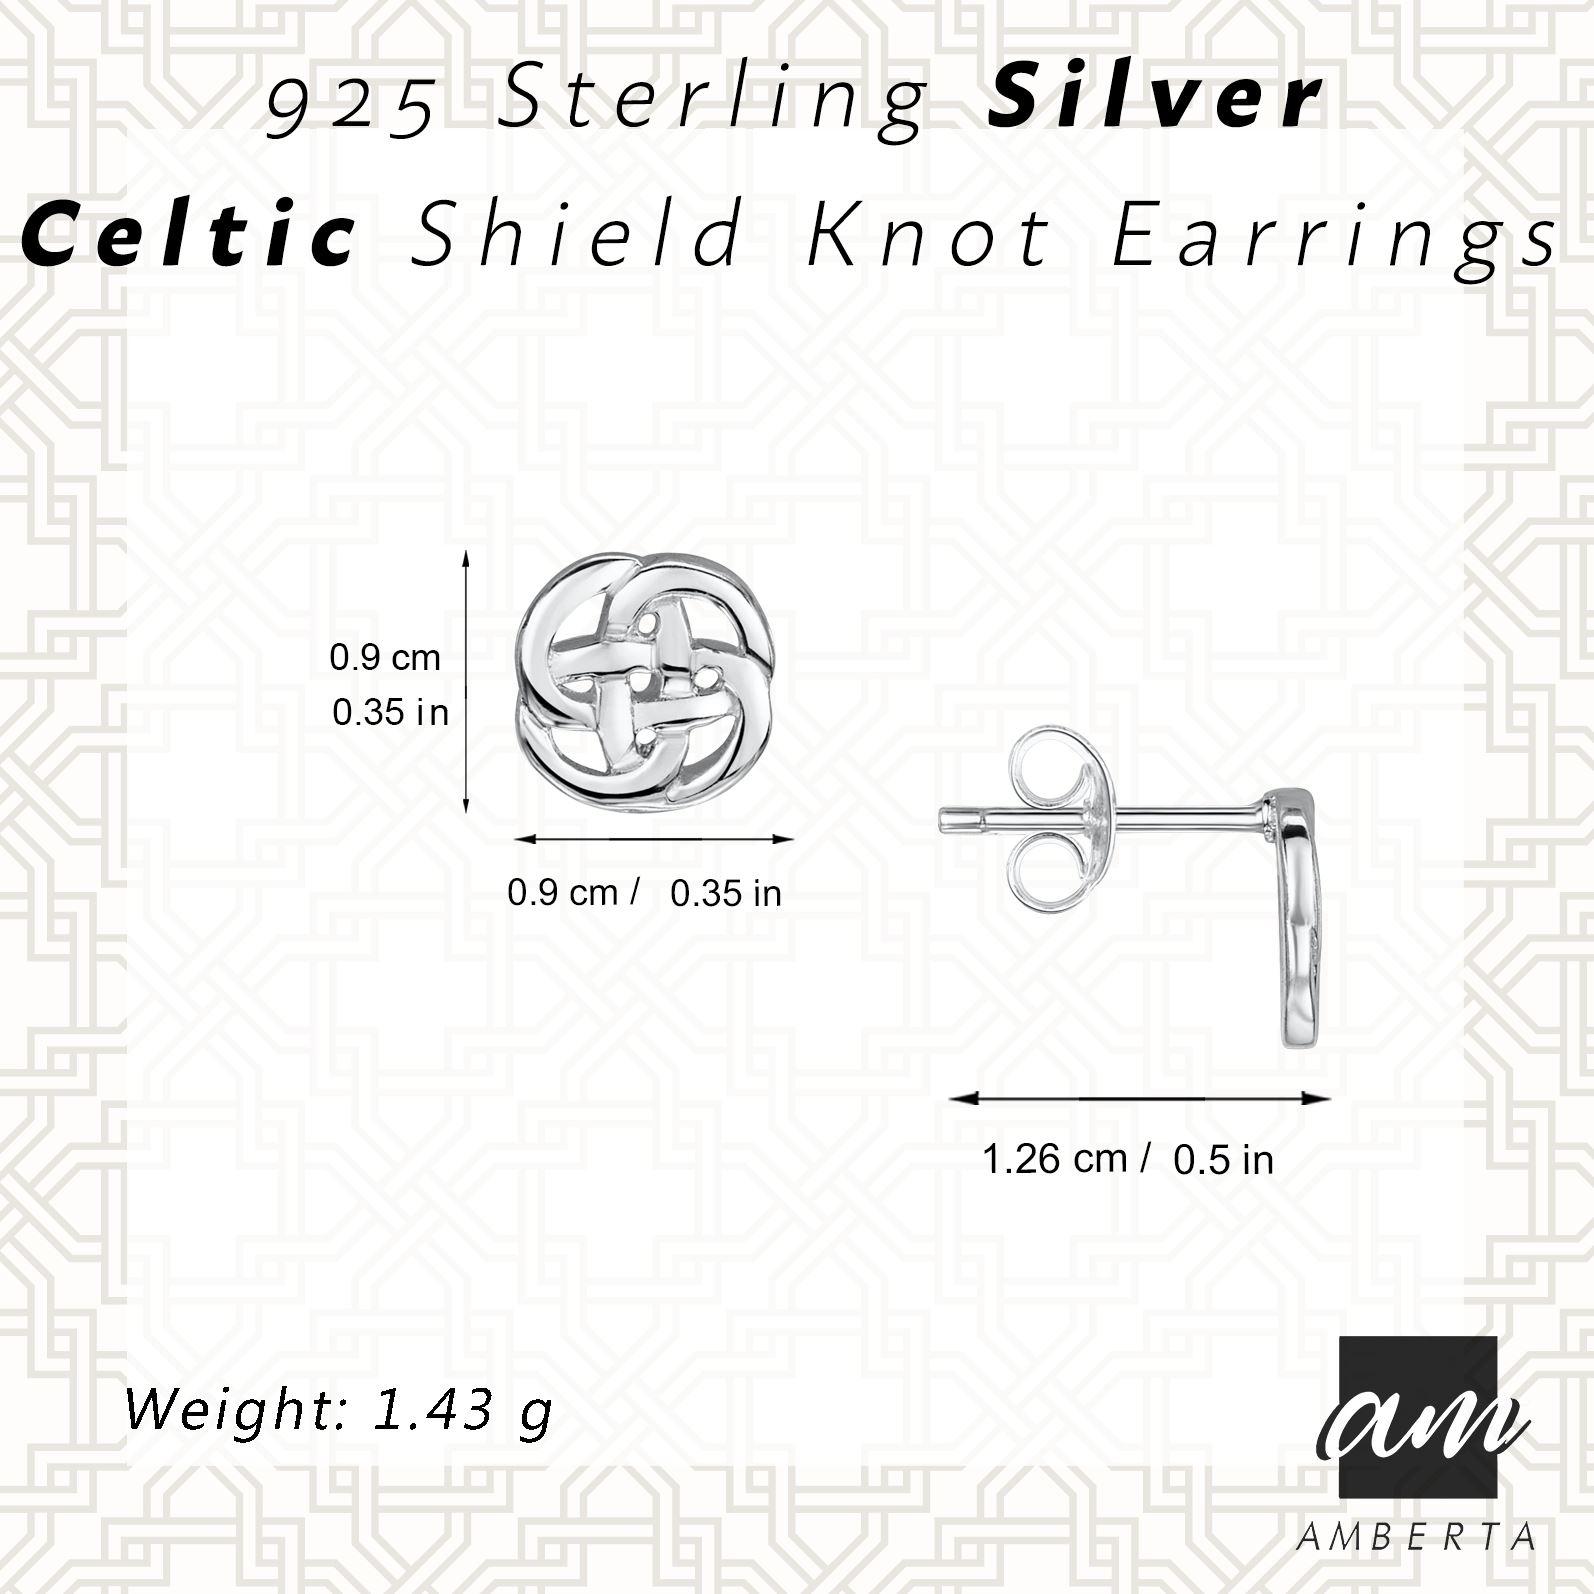 Amberta-925-Sterling-Silver-Celtic-Knot-Earrings-for-Women-Irish-Design miniature 3